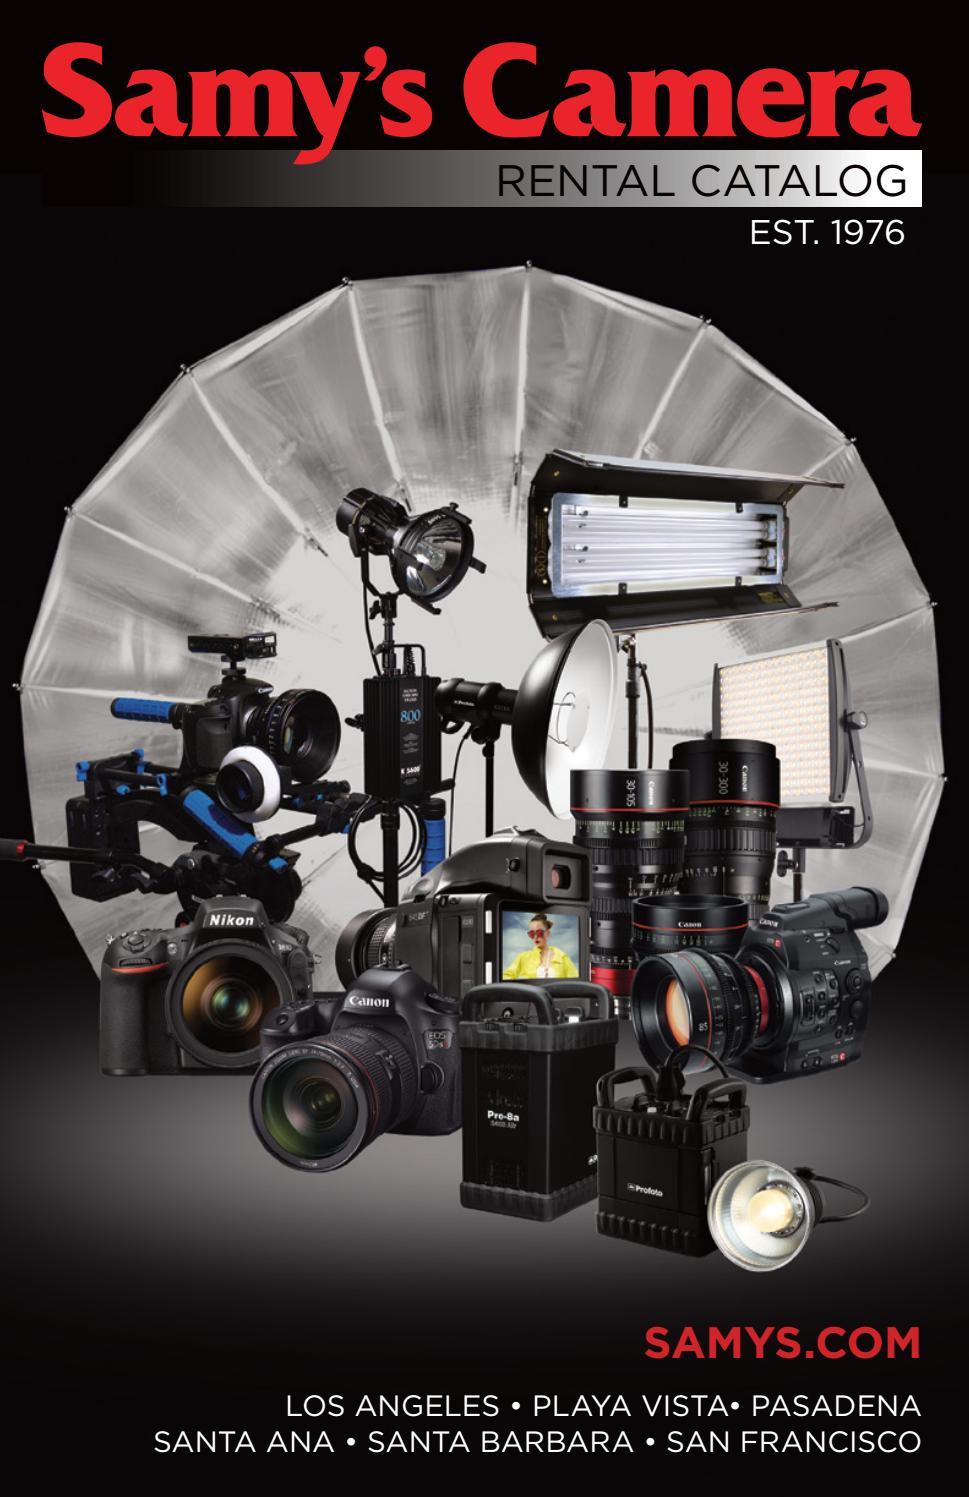 Samys Camera Rental Catalog By Issuu Suoer 2 In 1 Inverter Charger 500 Watt Typer Saa 500w C